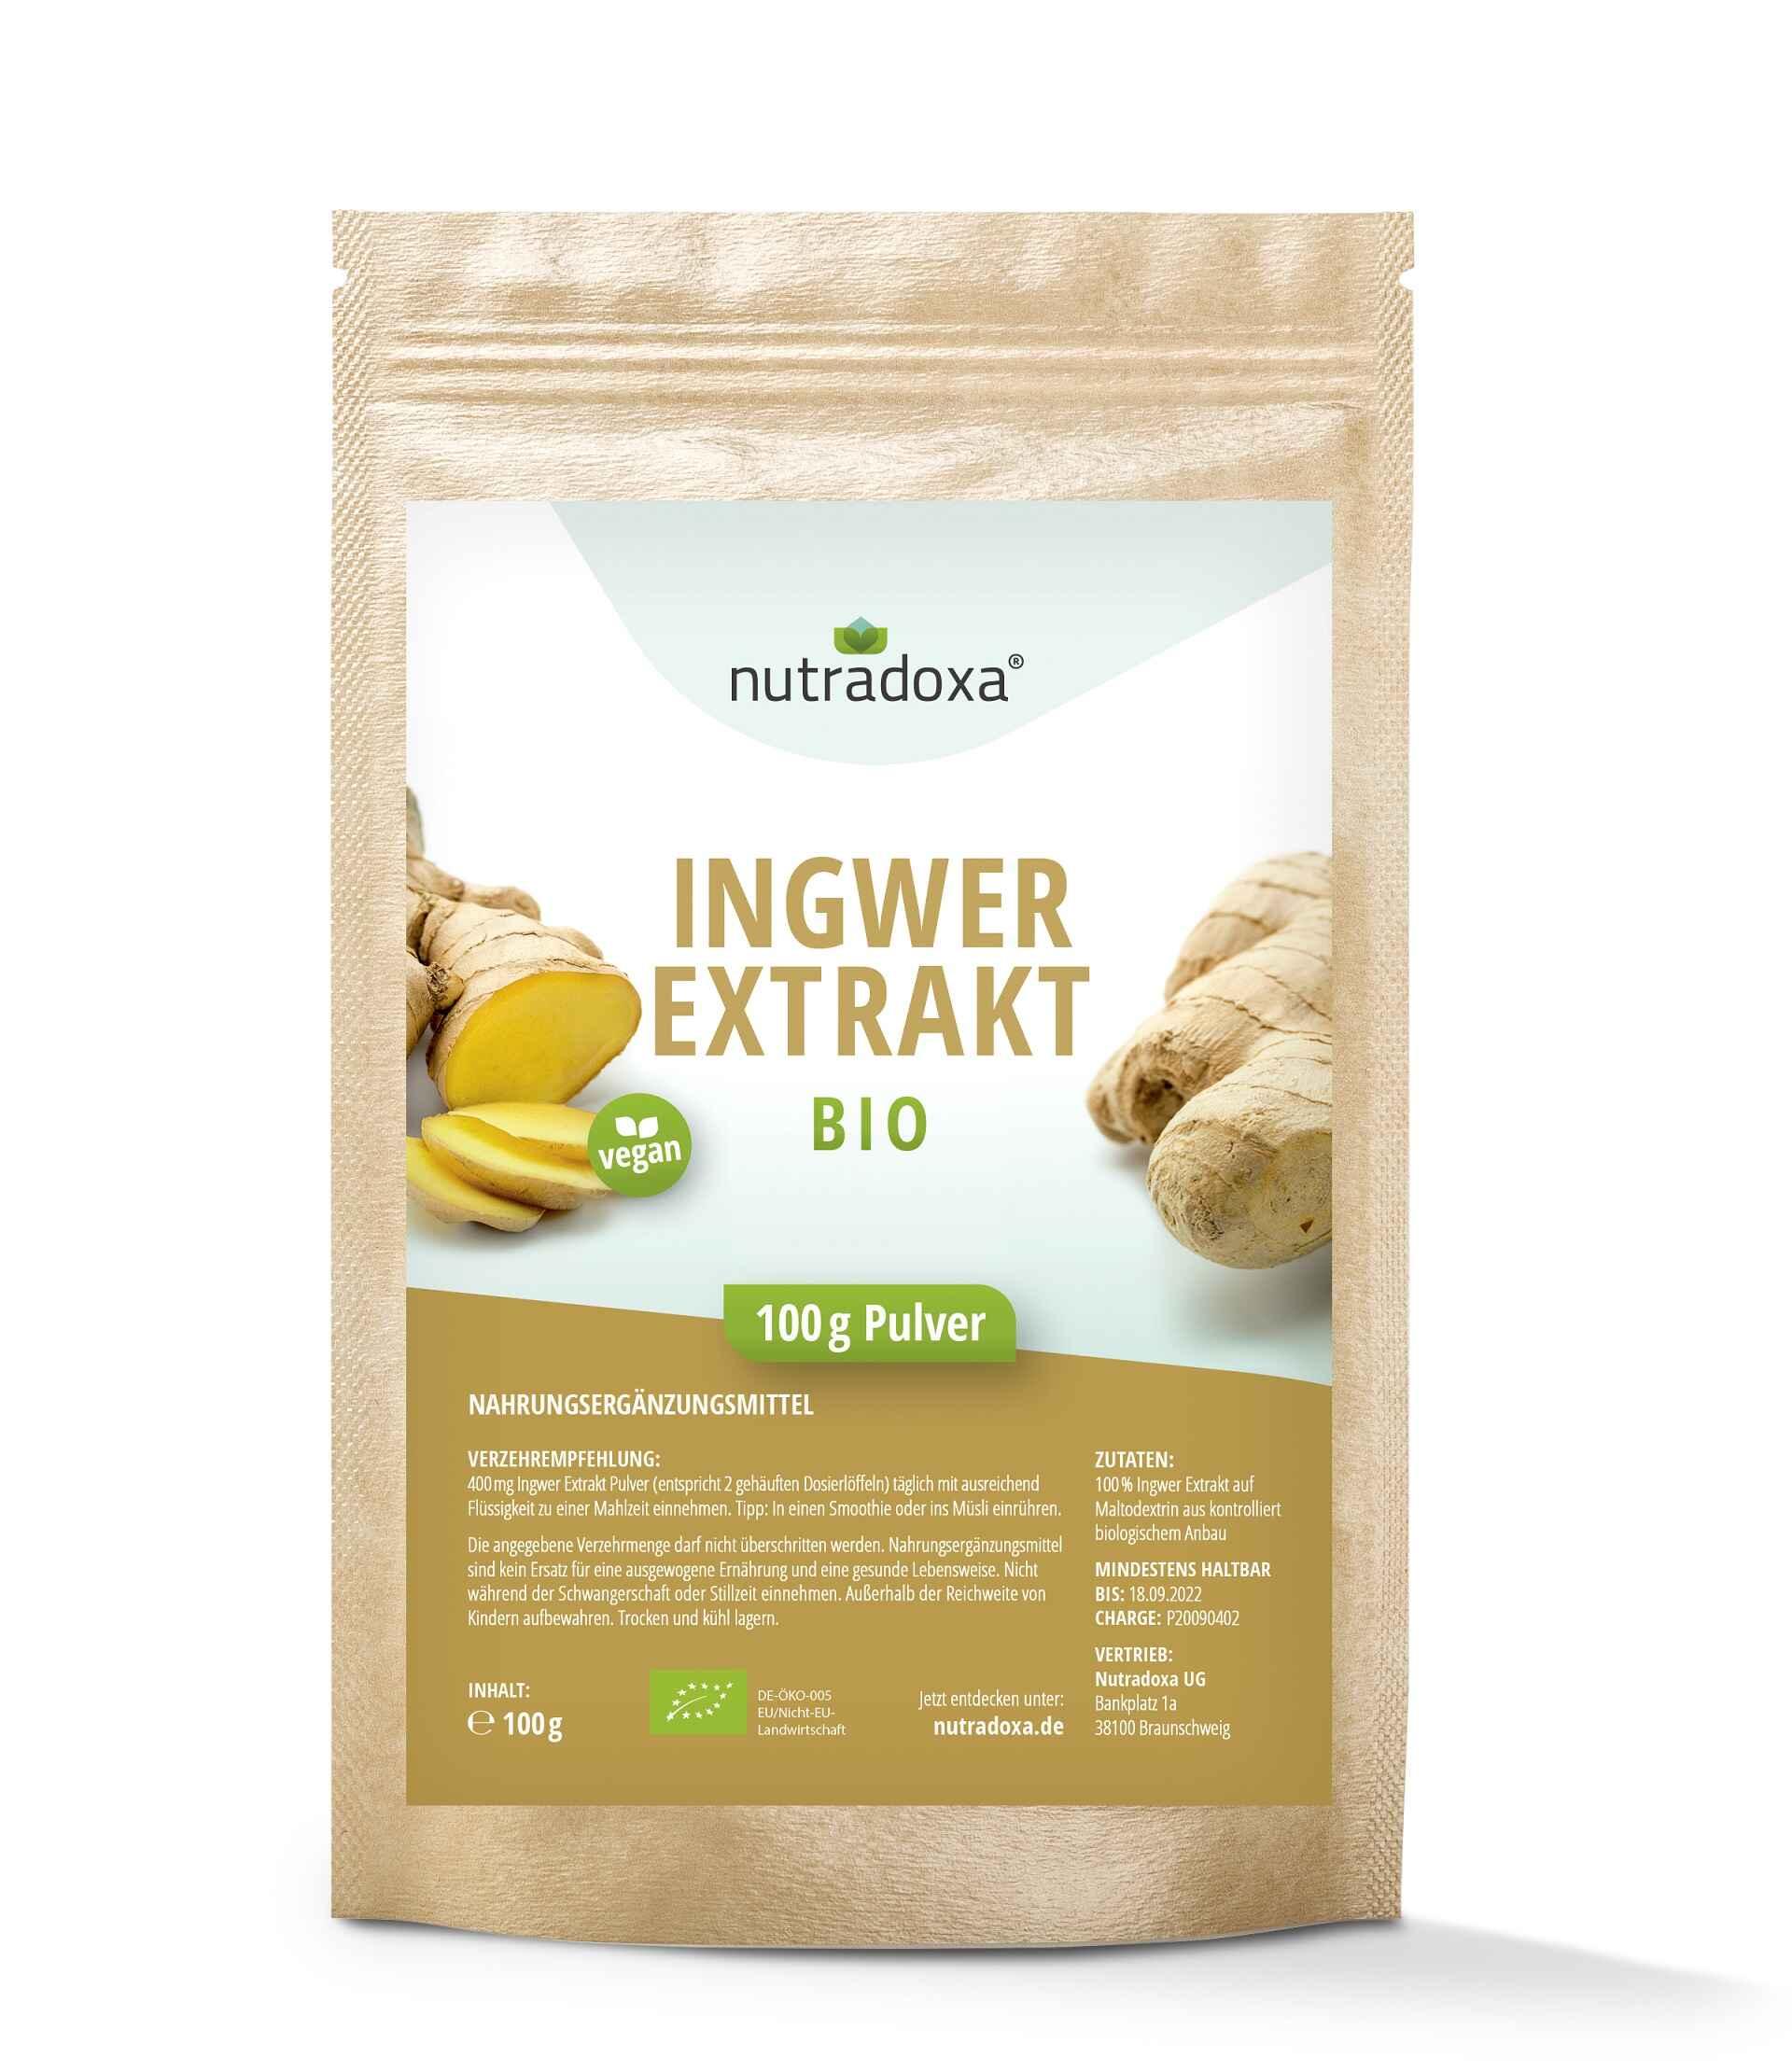 Bio Ingwer Extrakt